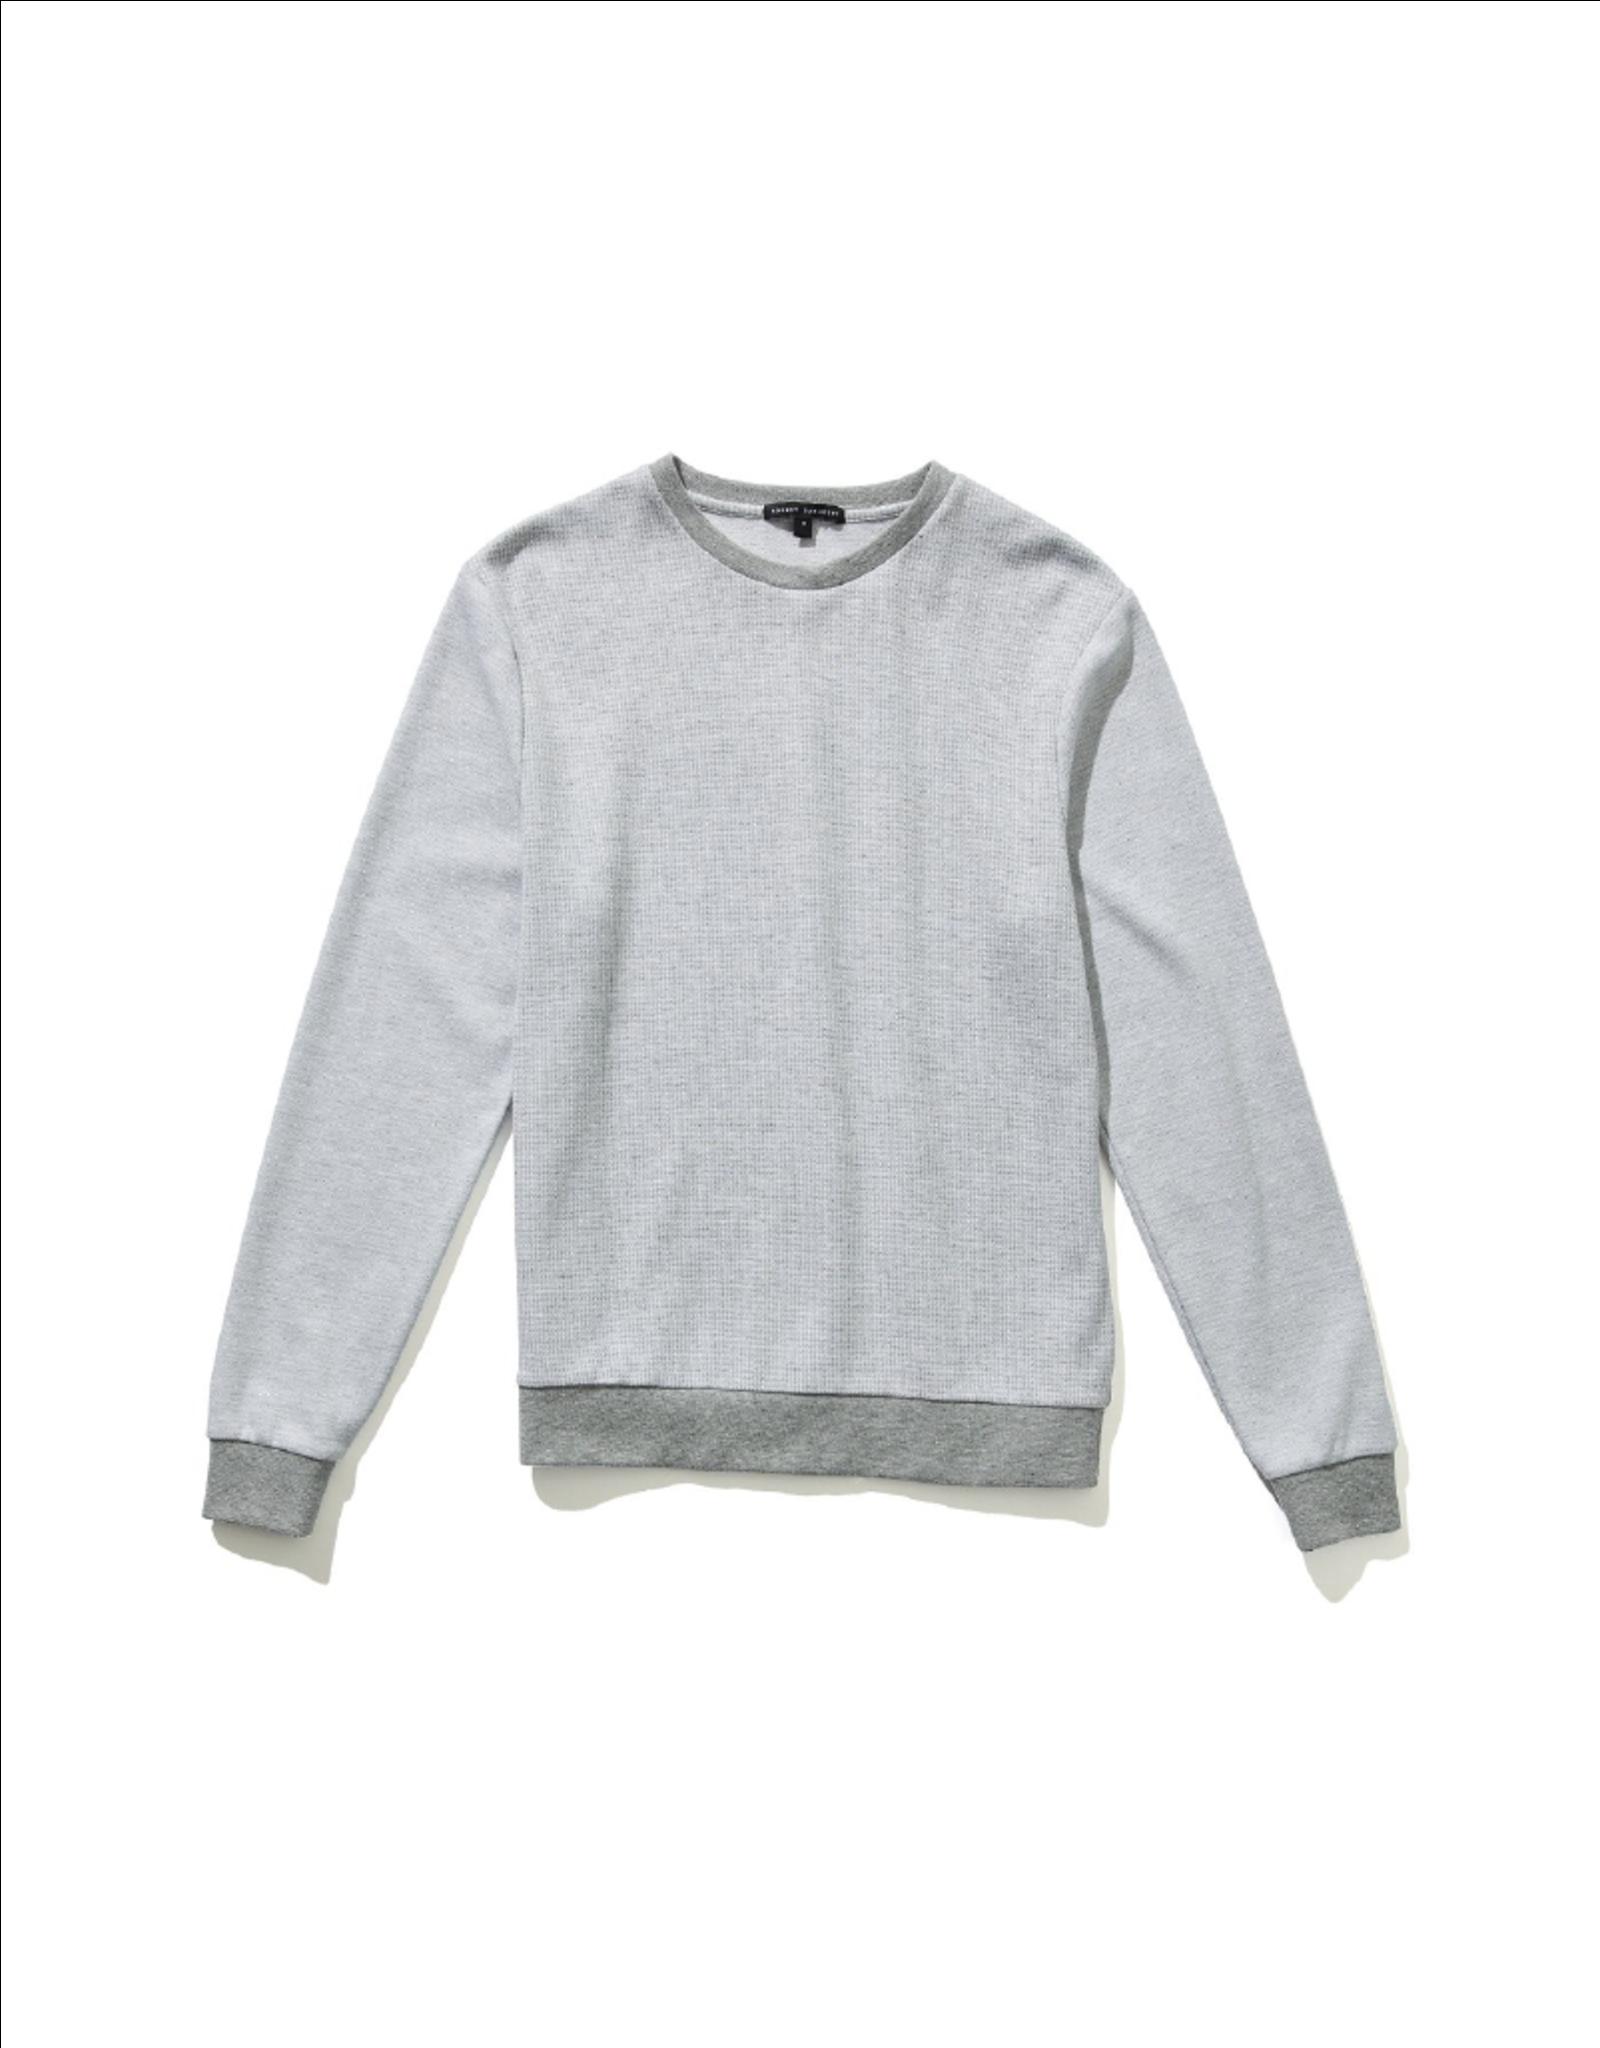 Robert Barakett Cavendish Long-Sleeve Fleece Pullover